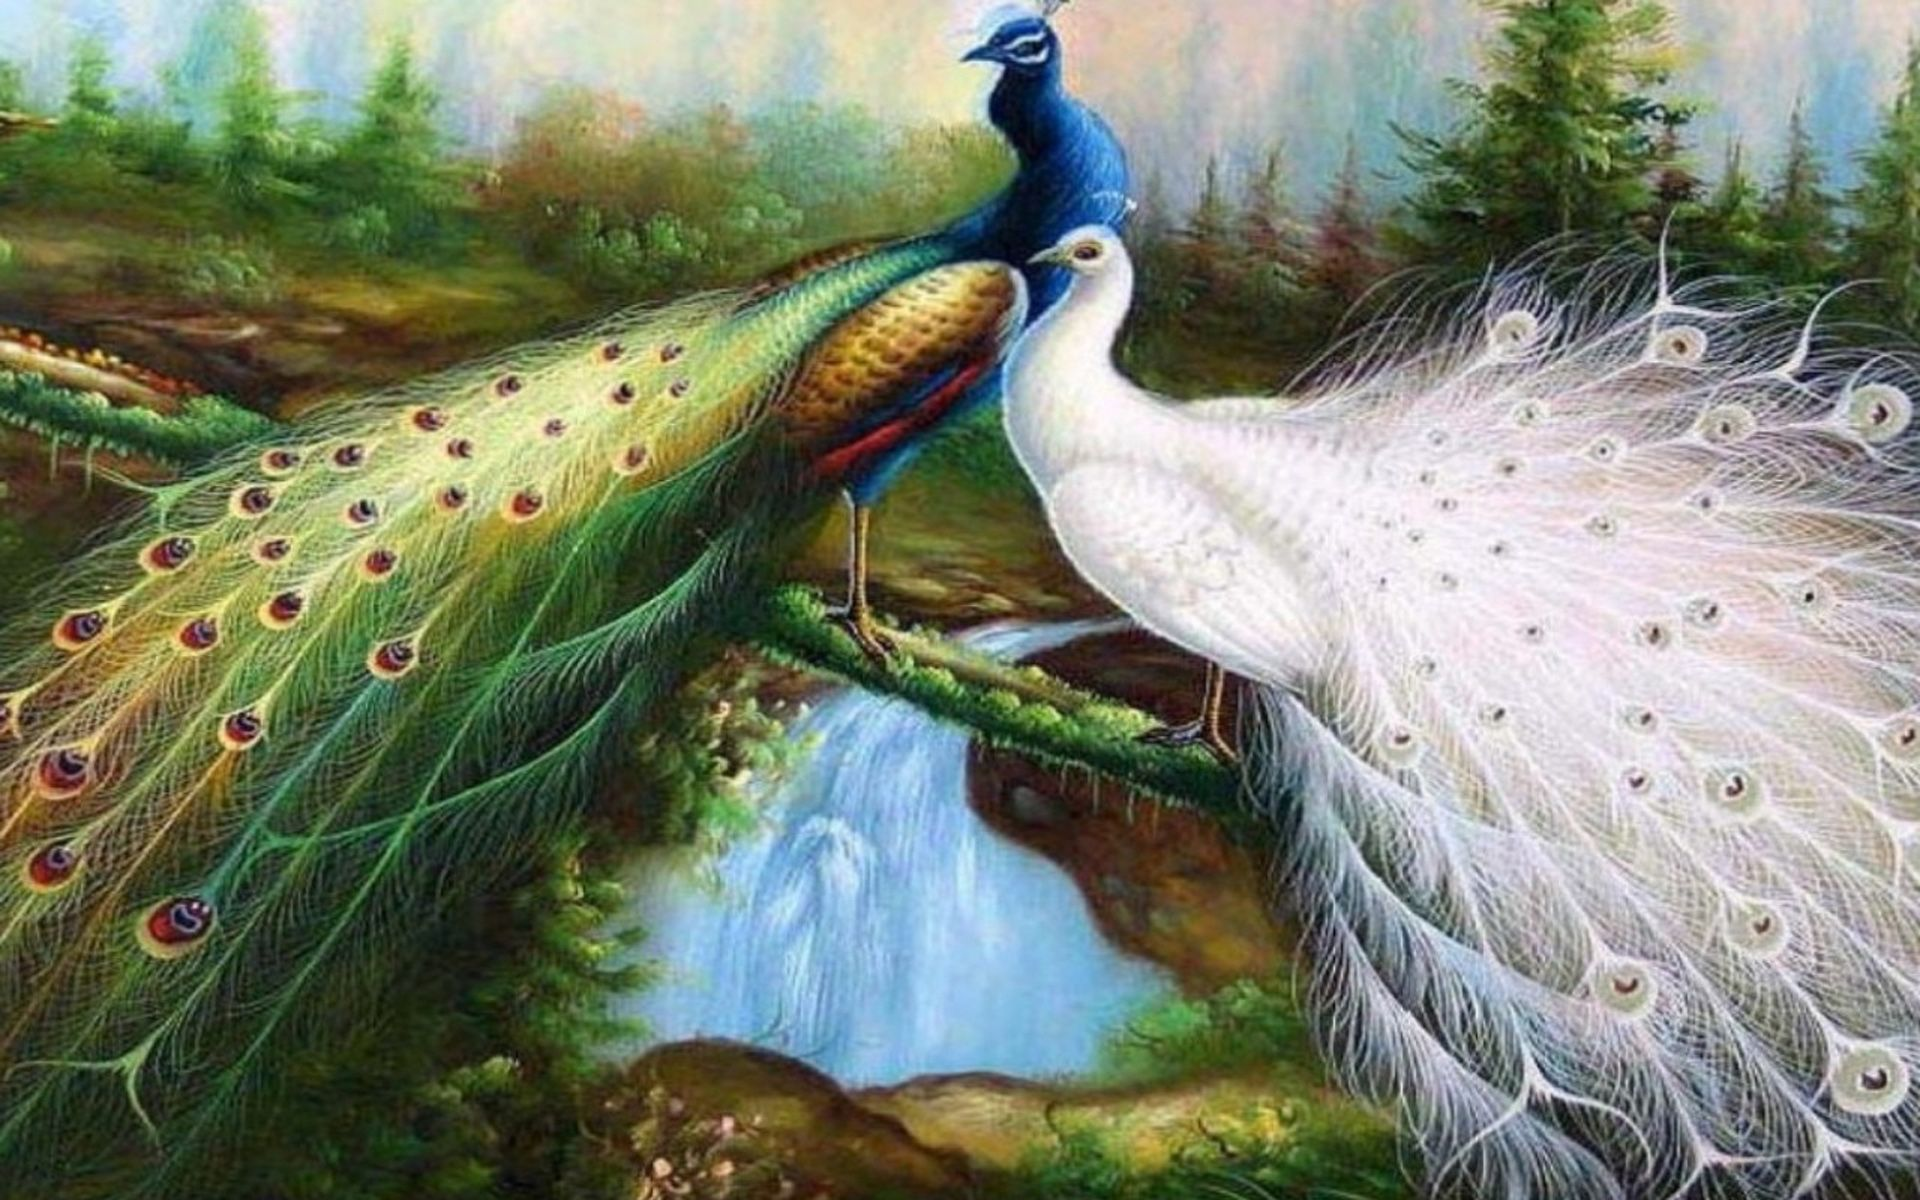 Peacock wallpaper roaming in garden 3DHD Wallpaper